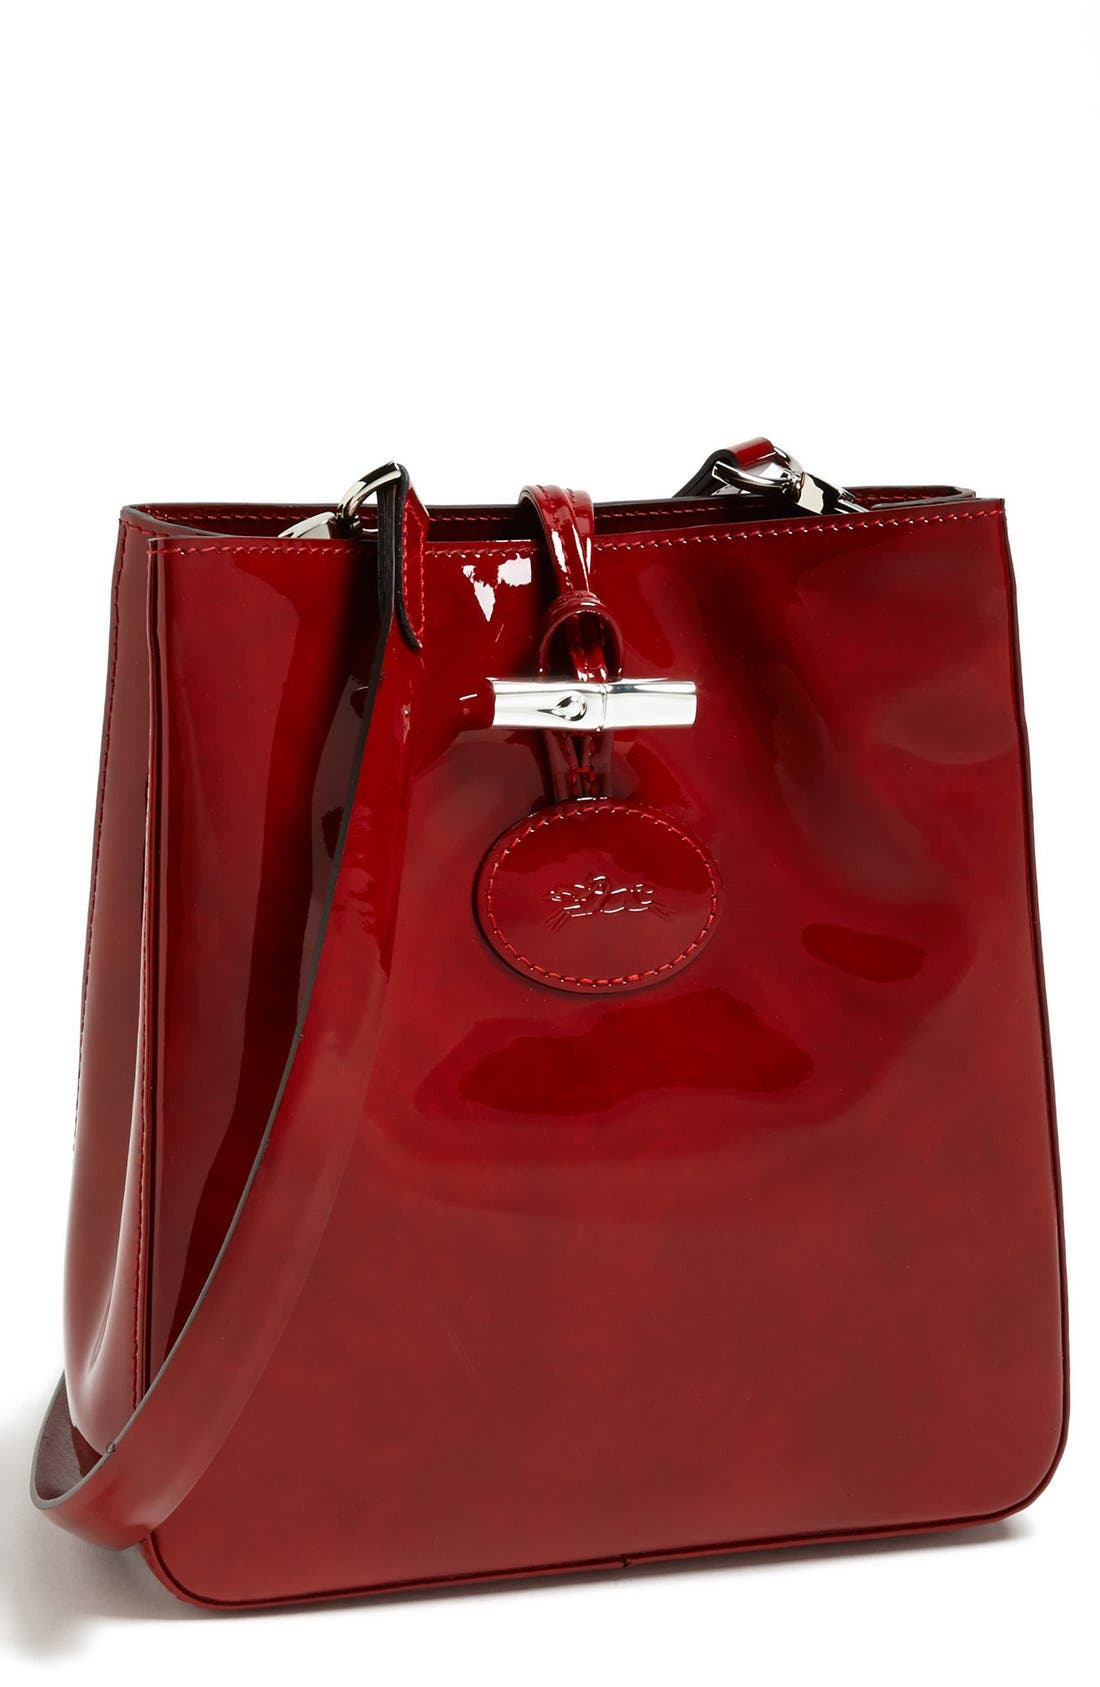 Alternate Image 1 Selected - Longchamp 'Roseau Box' Crossbody Bag